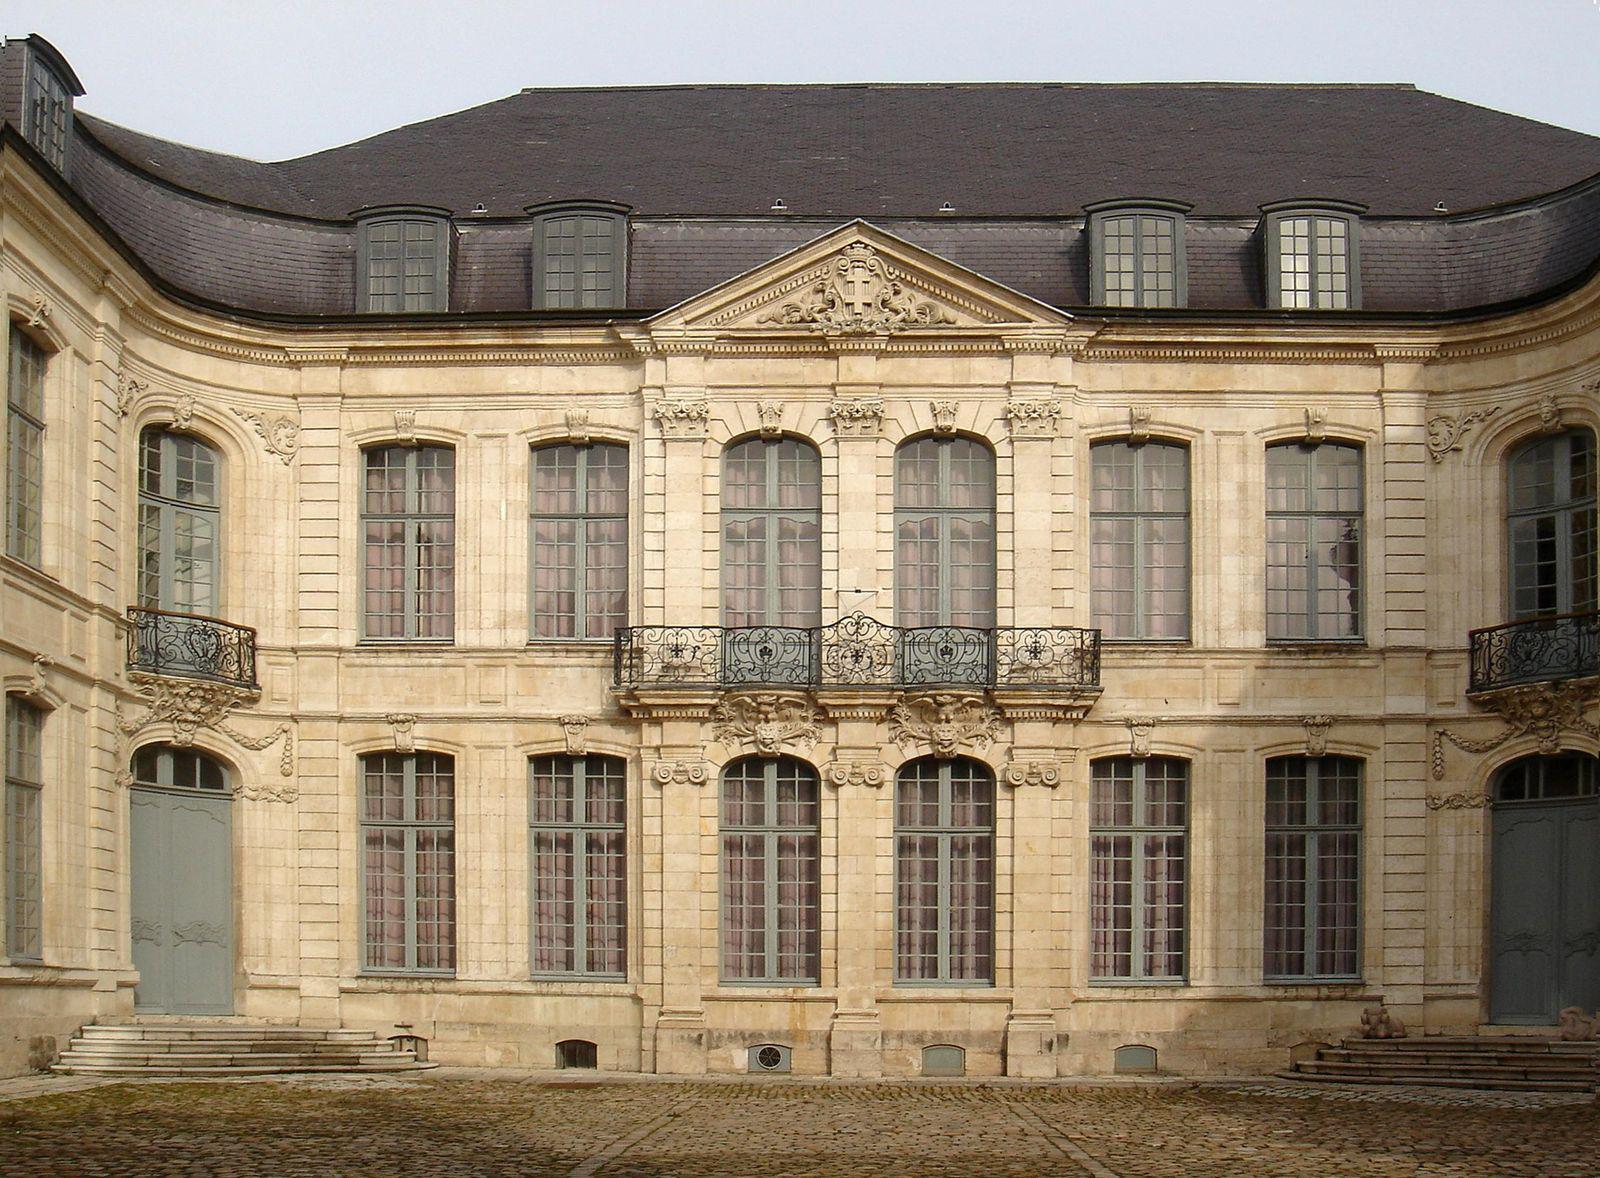 Musée de l'Hôtel Sandelin_Saint-Omer